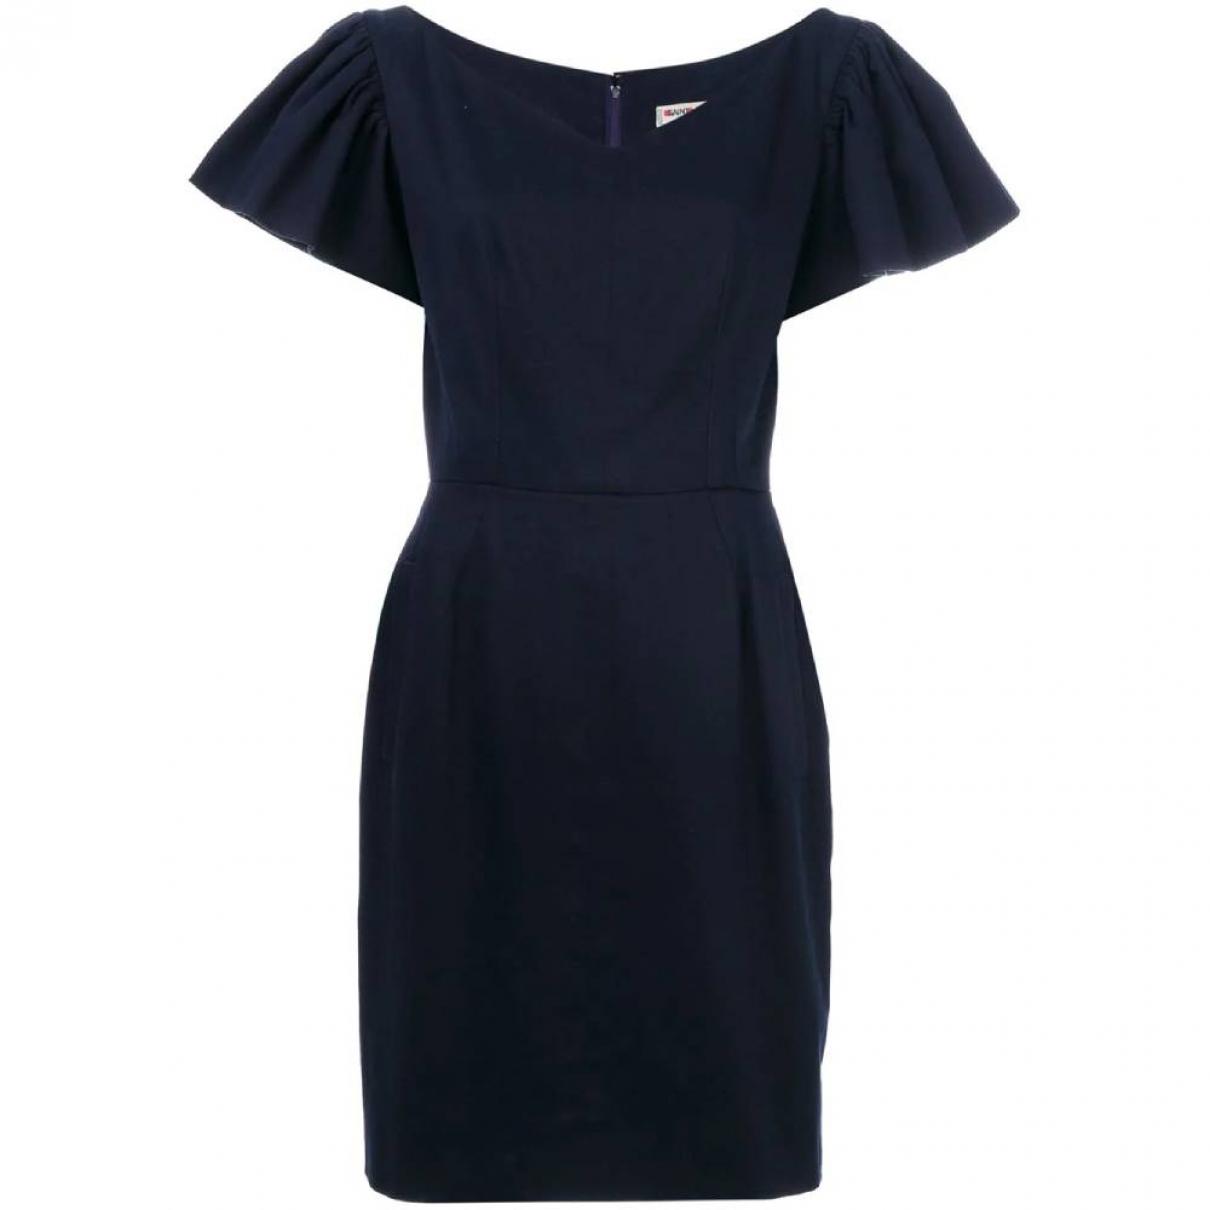 Yves Saint Laurent \N Navy Cotton dress for Women 42 IT